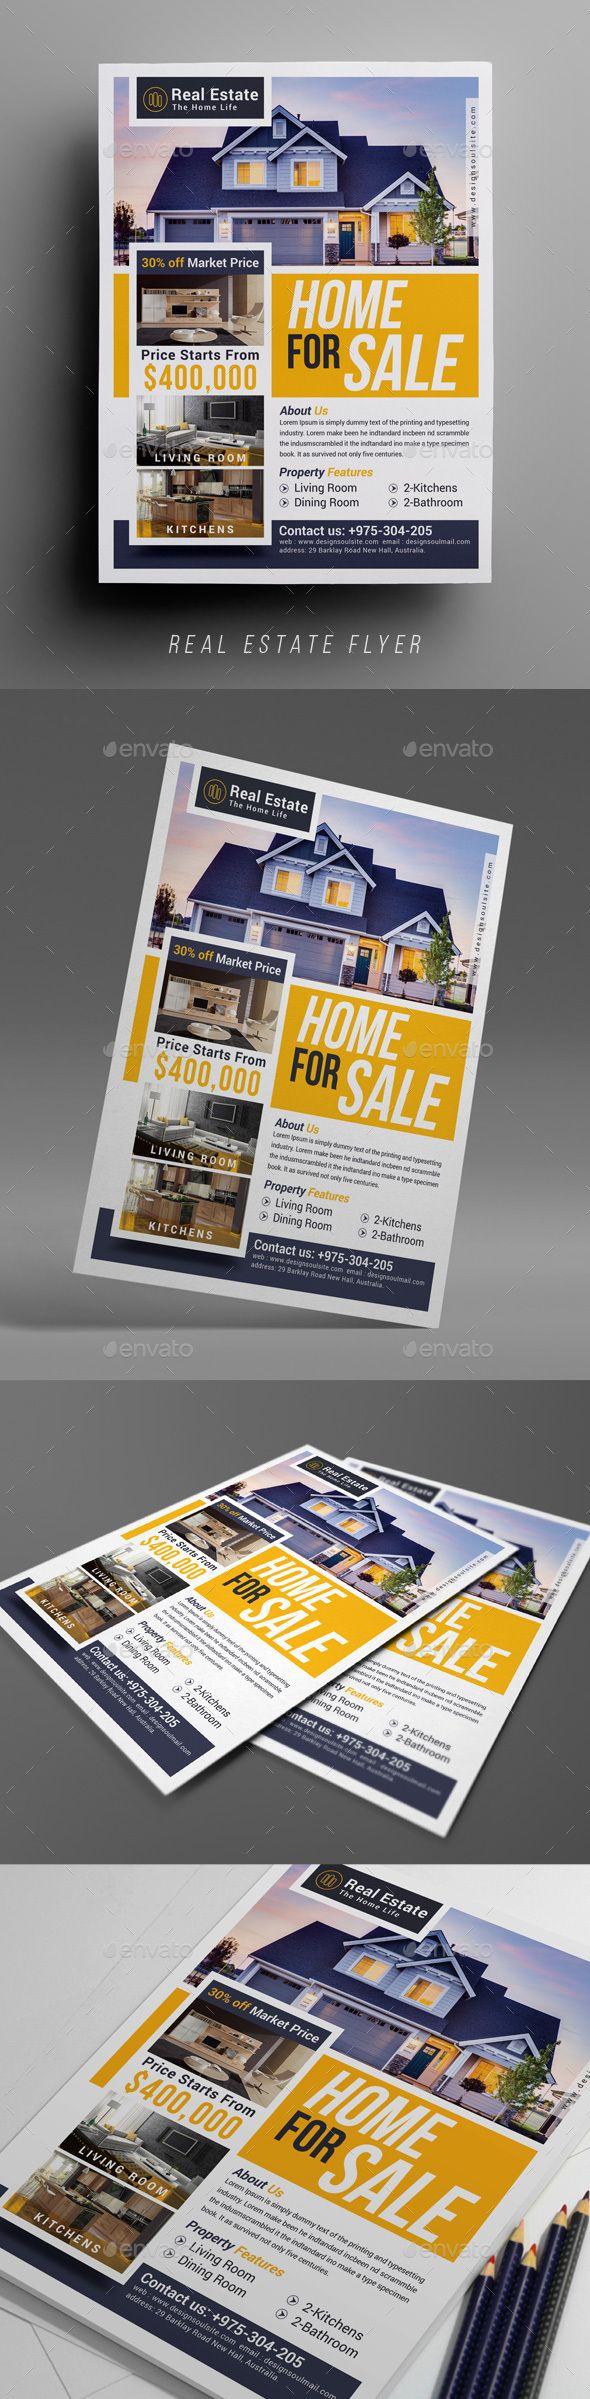 Real Estate Flyer Real Estate Flyers Flyer Real Estate Flyer Template